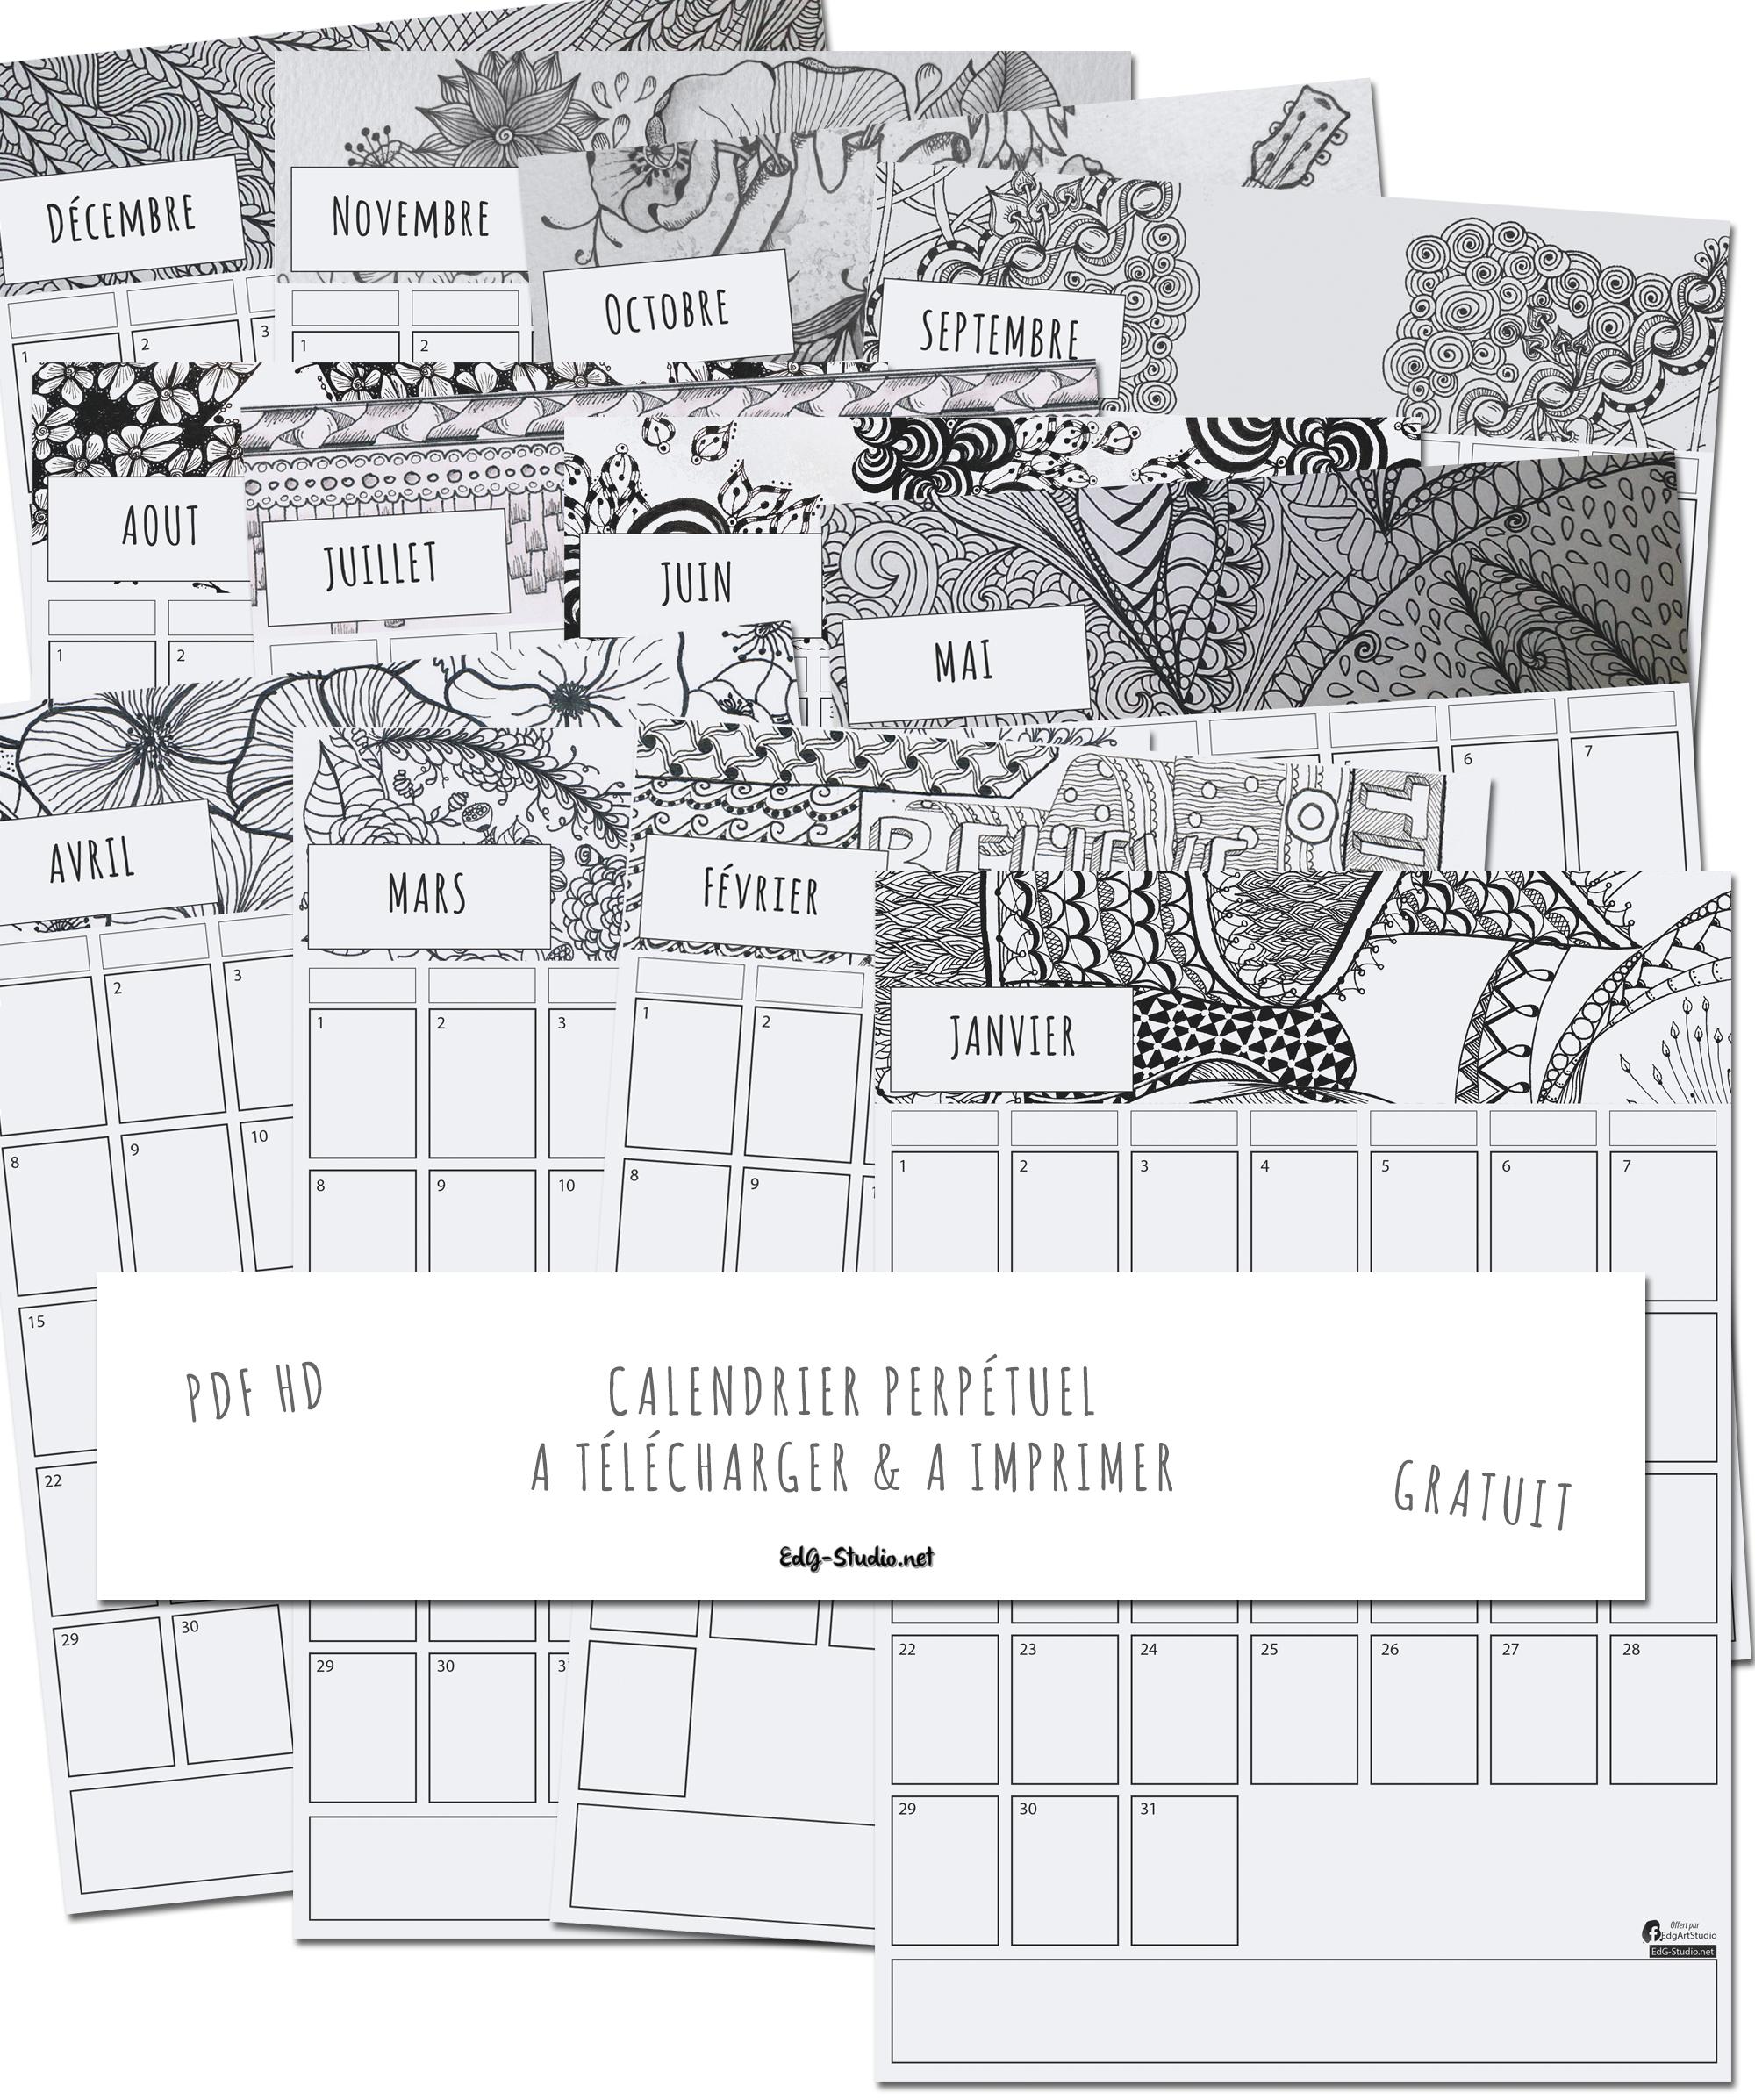 Calendrier Perpétuel À Imprimer – Ed. G Studio encequiconcerne Calendrier Perpétuel À Imprimer